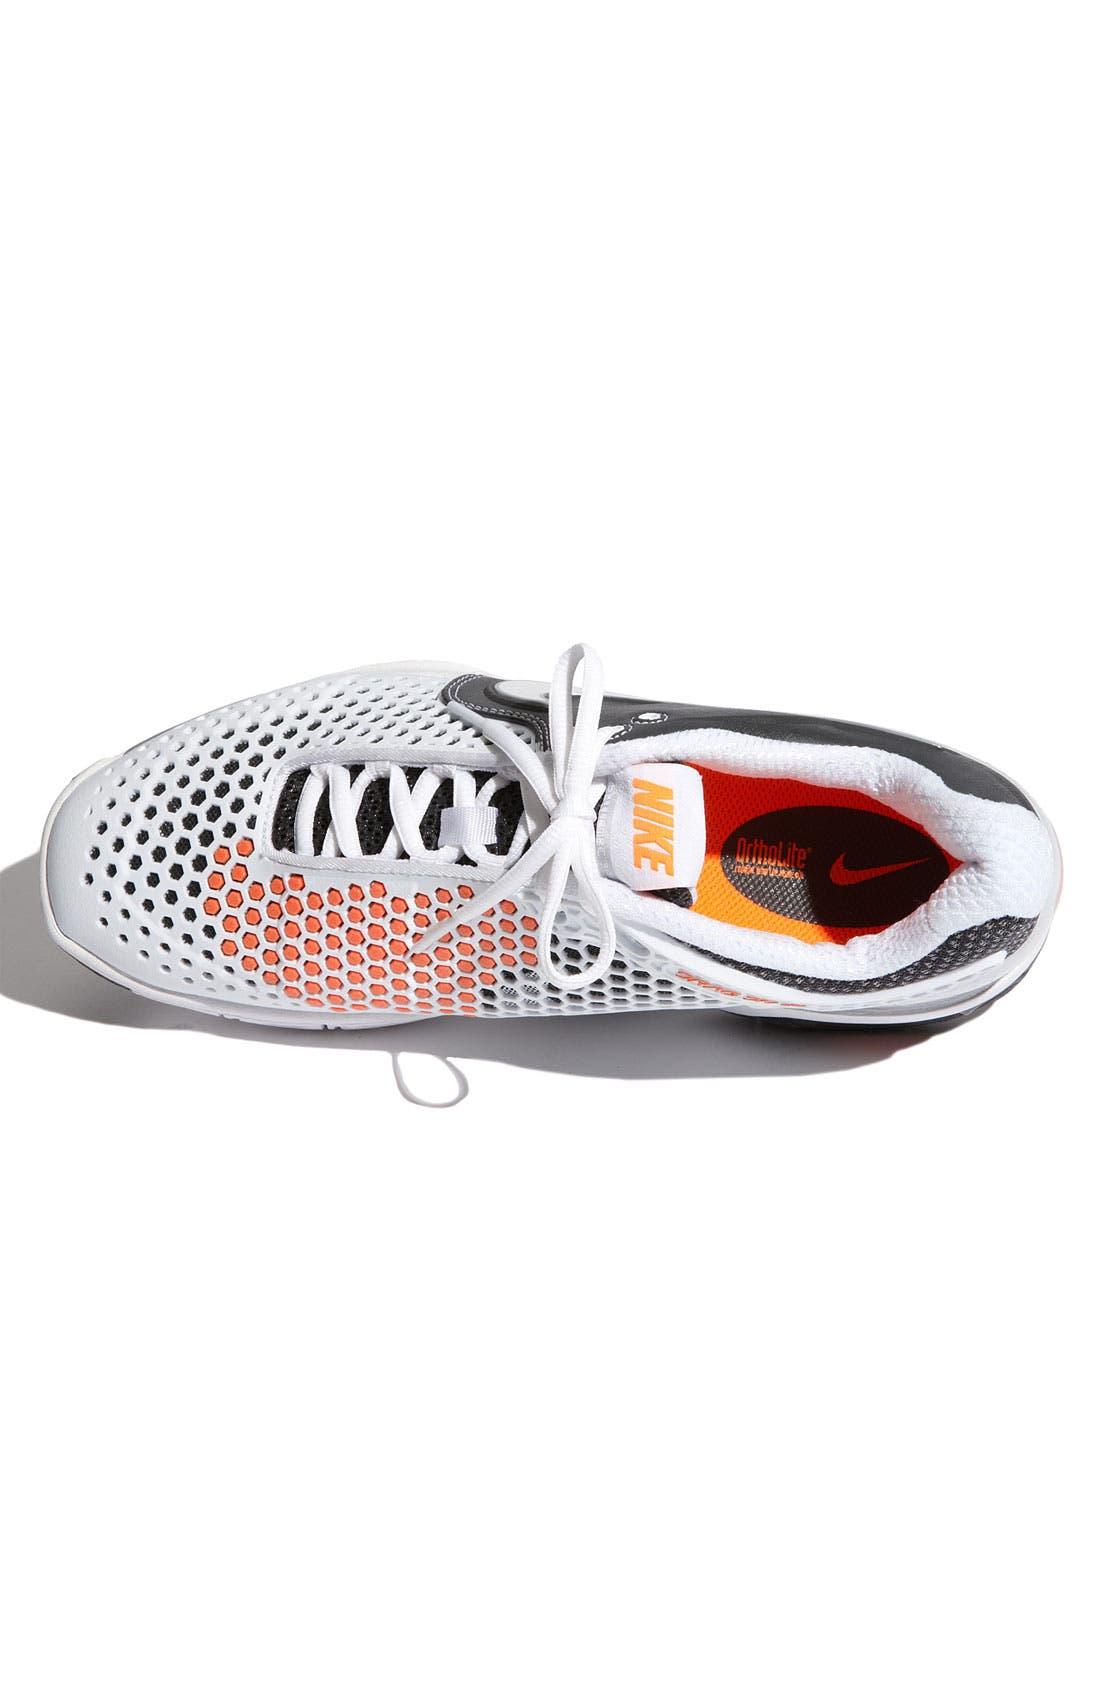 Alternate Image 2  - Nike 'Air Max Court Ballistic 3.3' Tennis Shoe (Men)